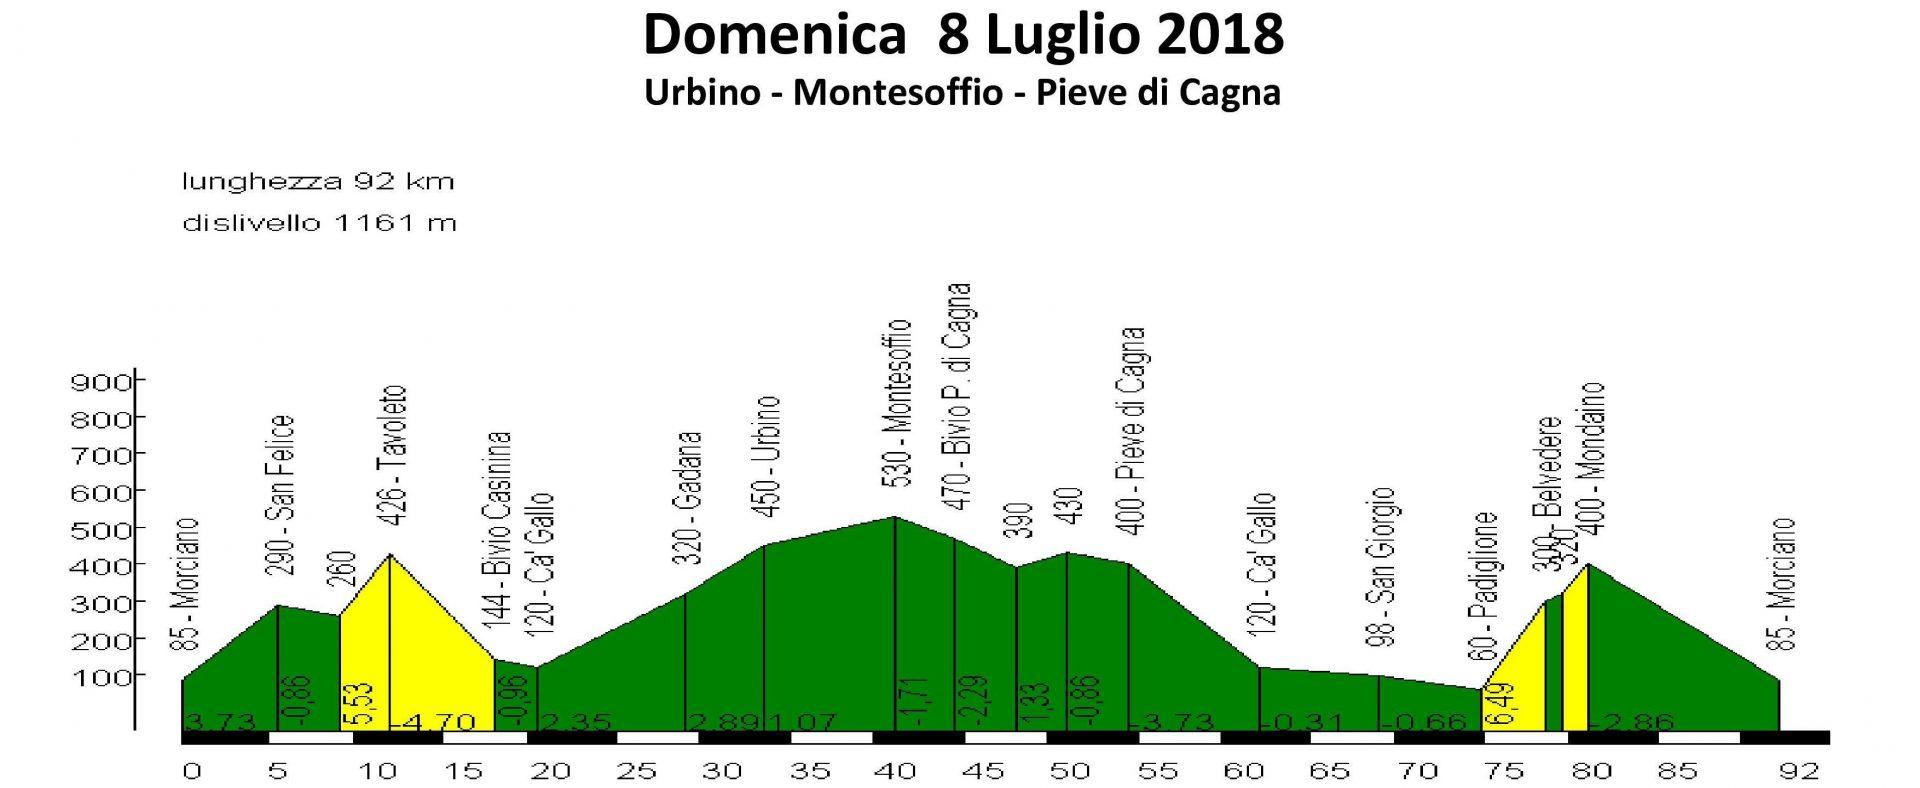 Domenica 08-lug-2018 Montesoffio